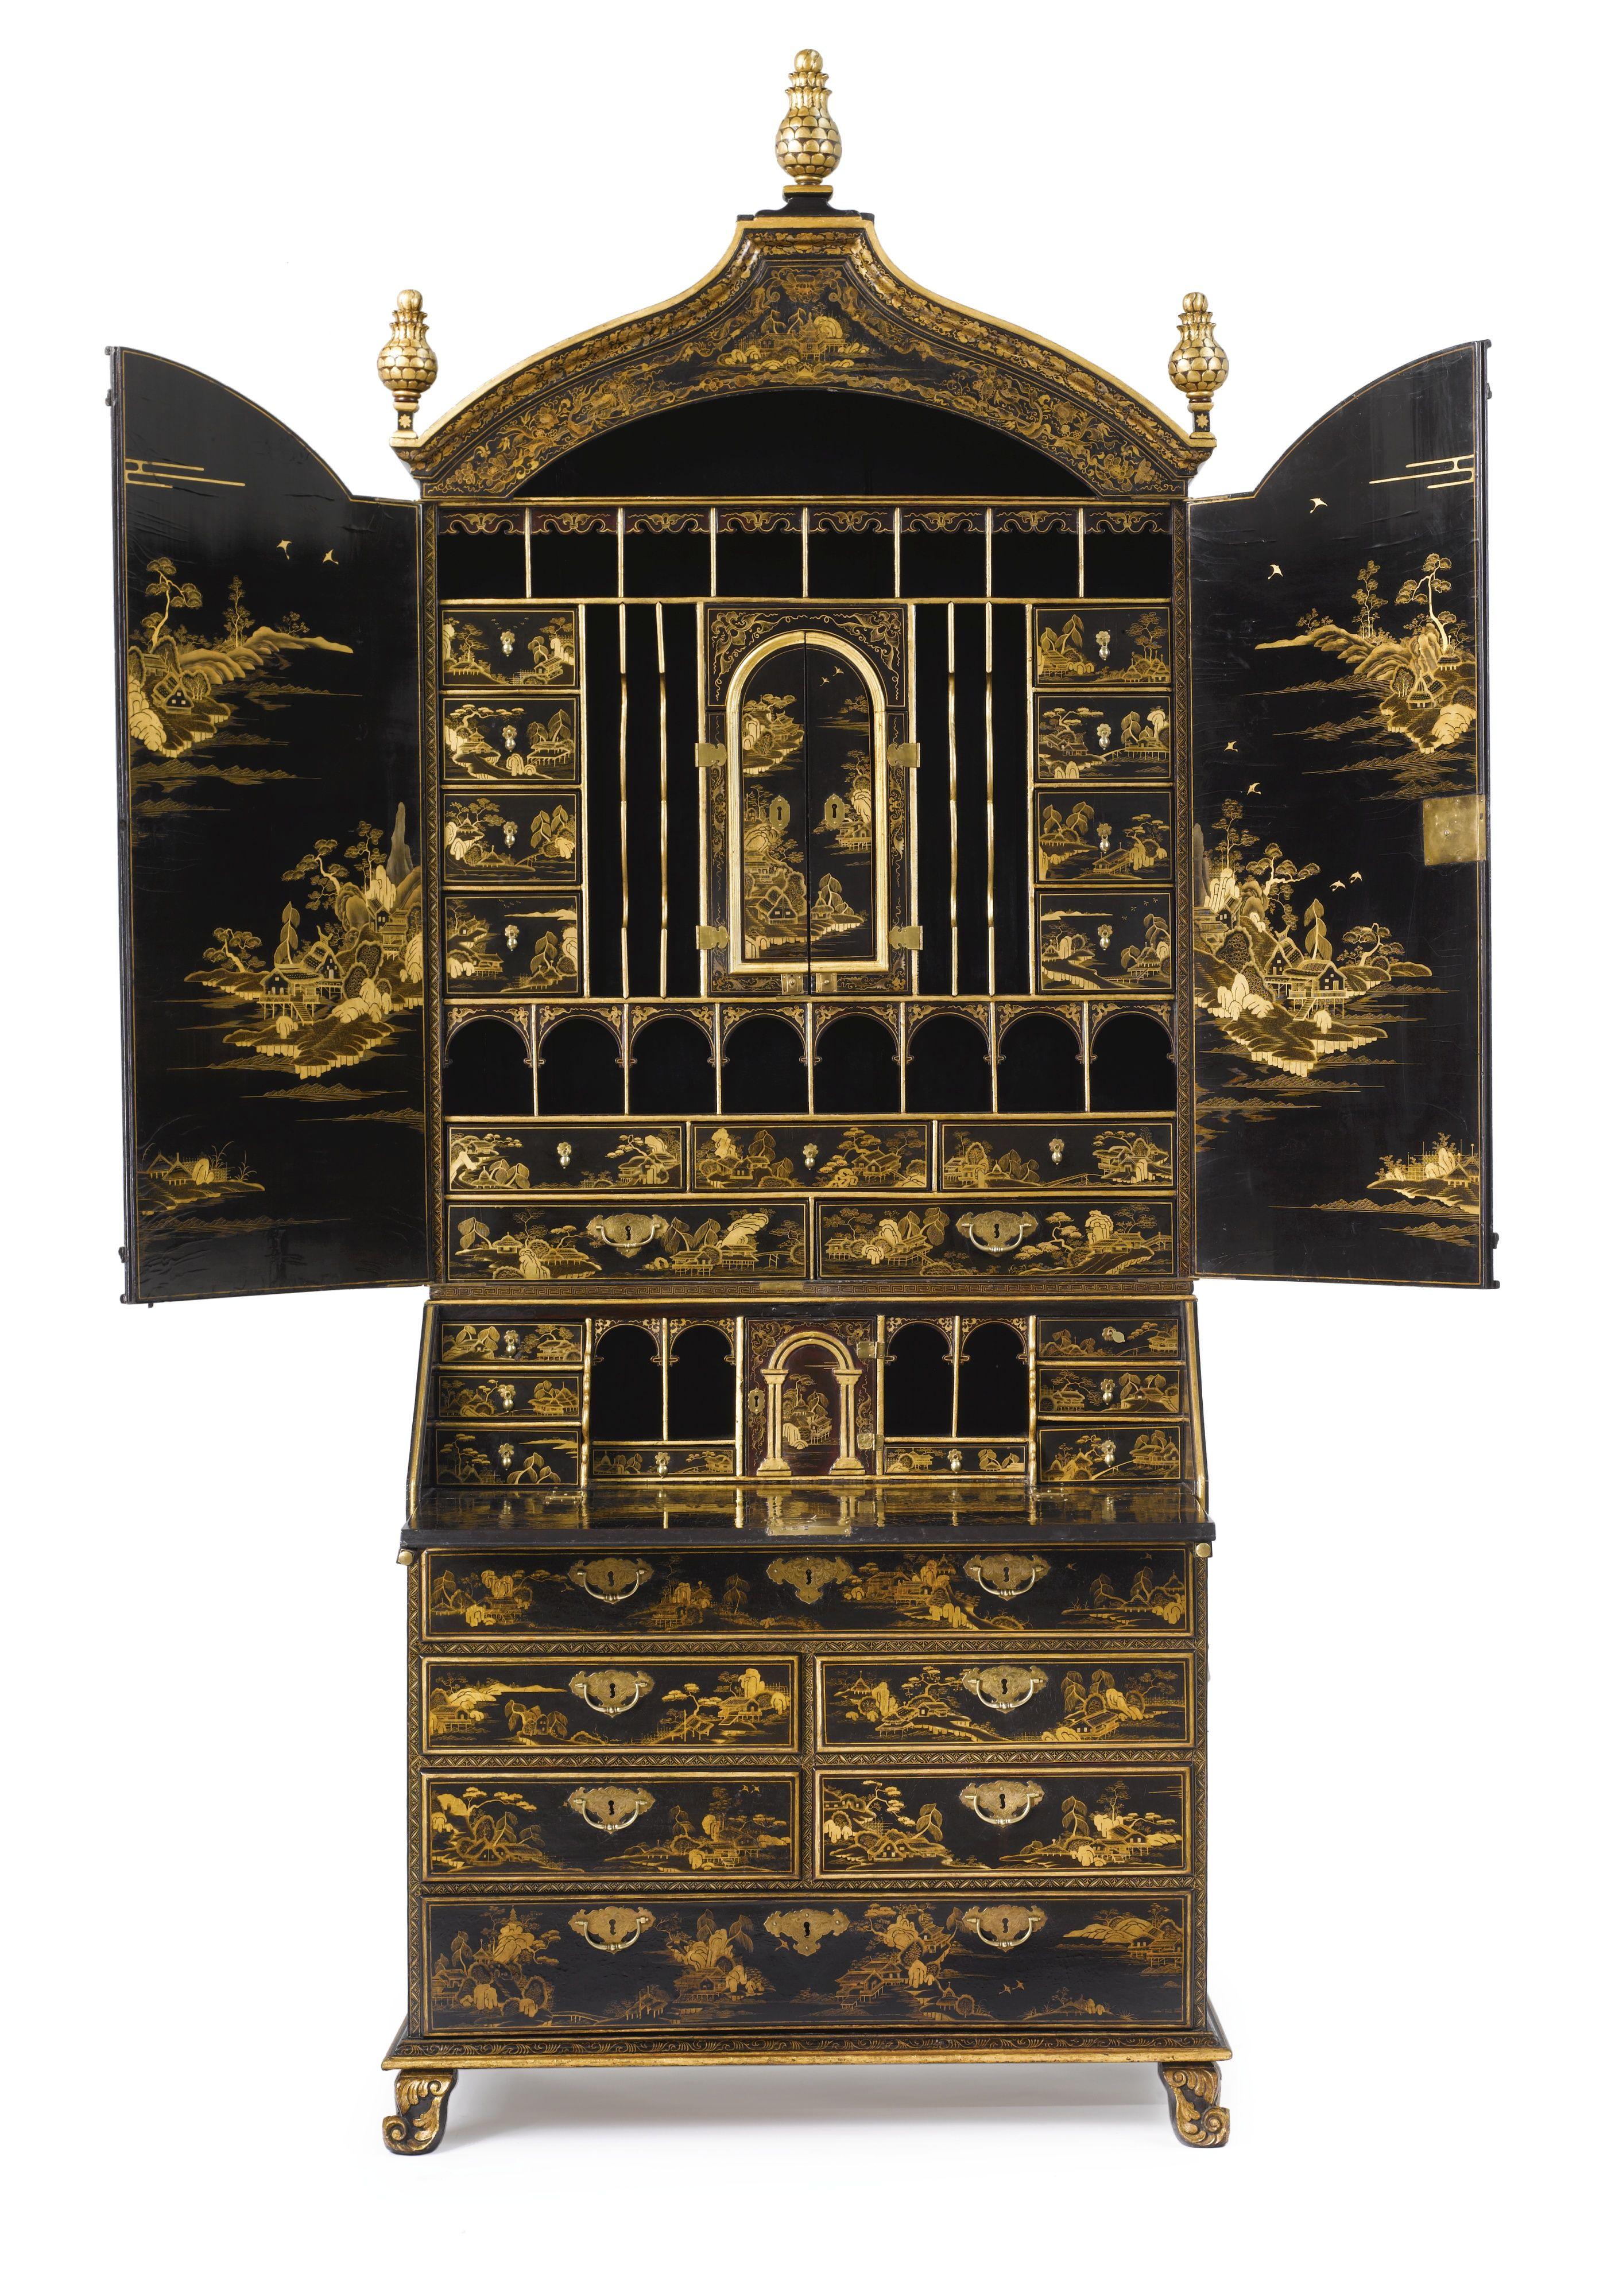 C1735 A Fine Chinese Export Parcel Gilt Black Lacquer Bureau Bookcase Cabinet Circa 1735 Estimación